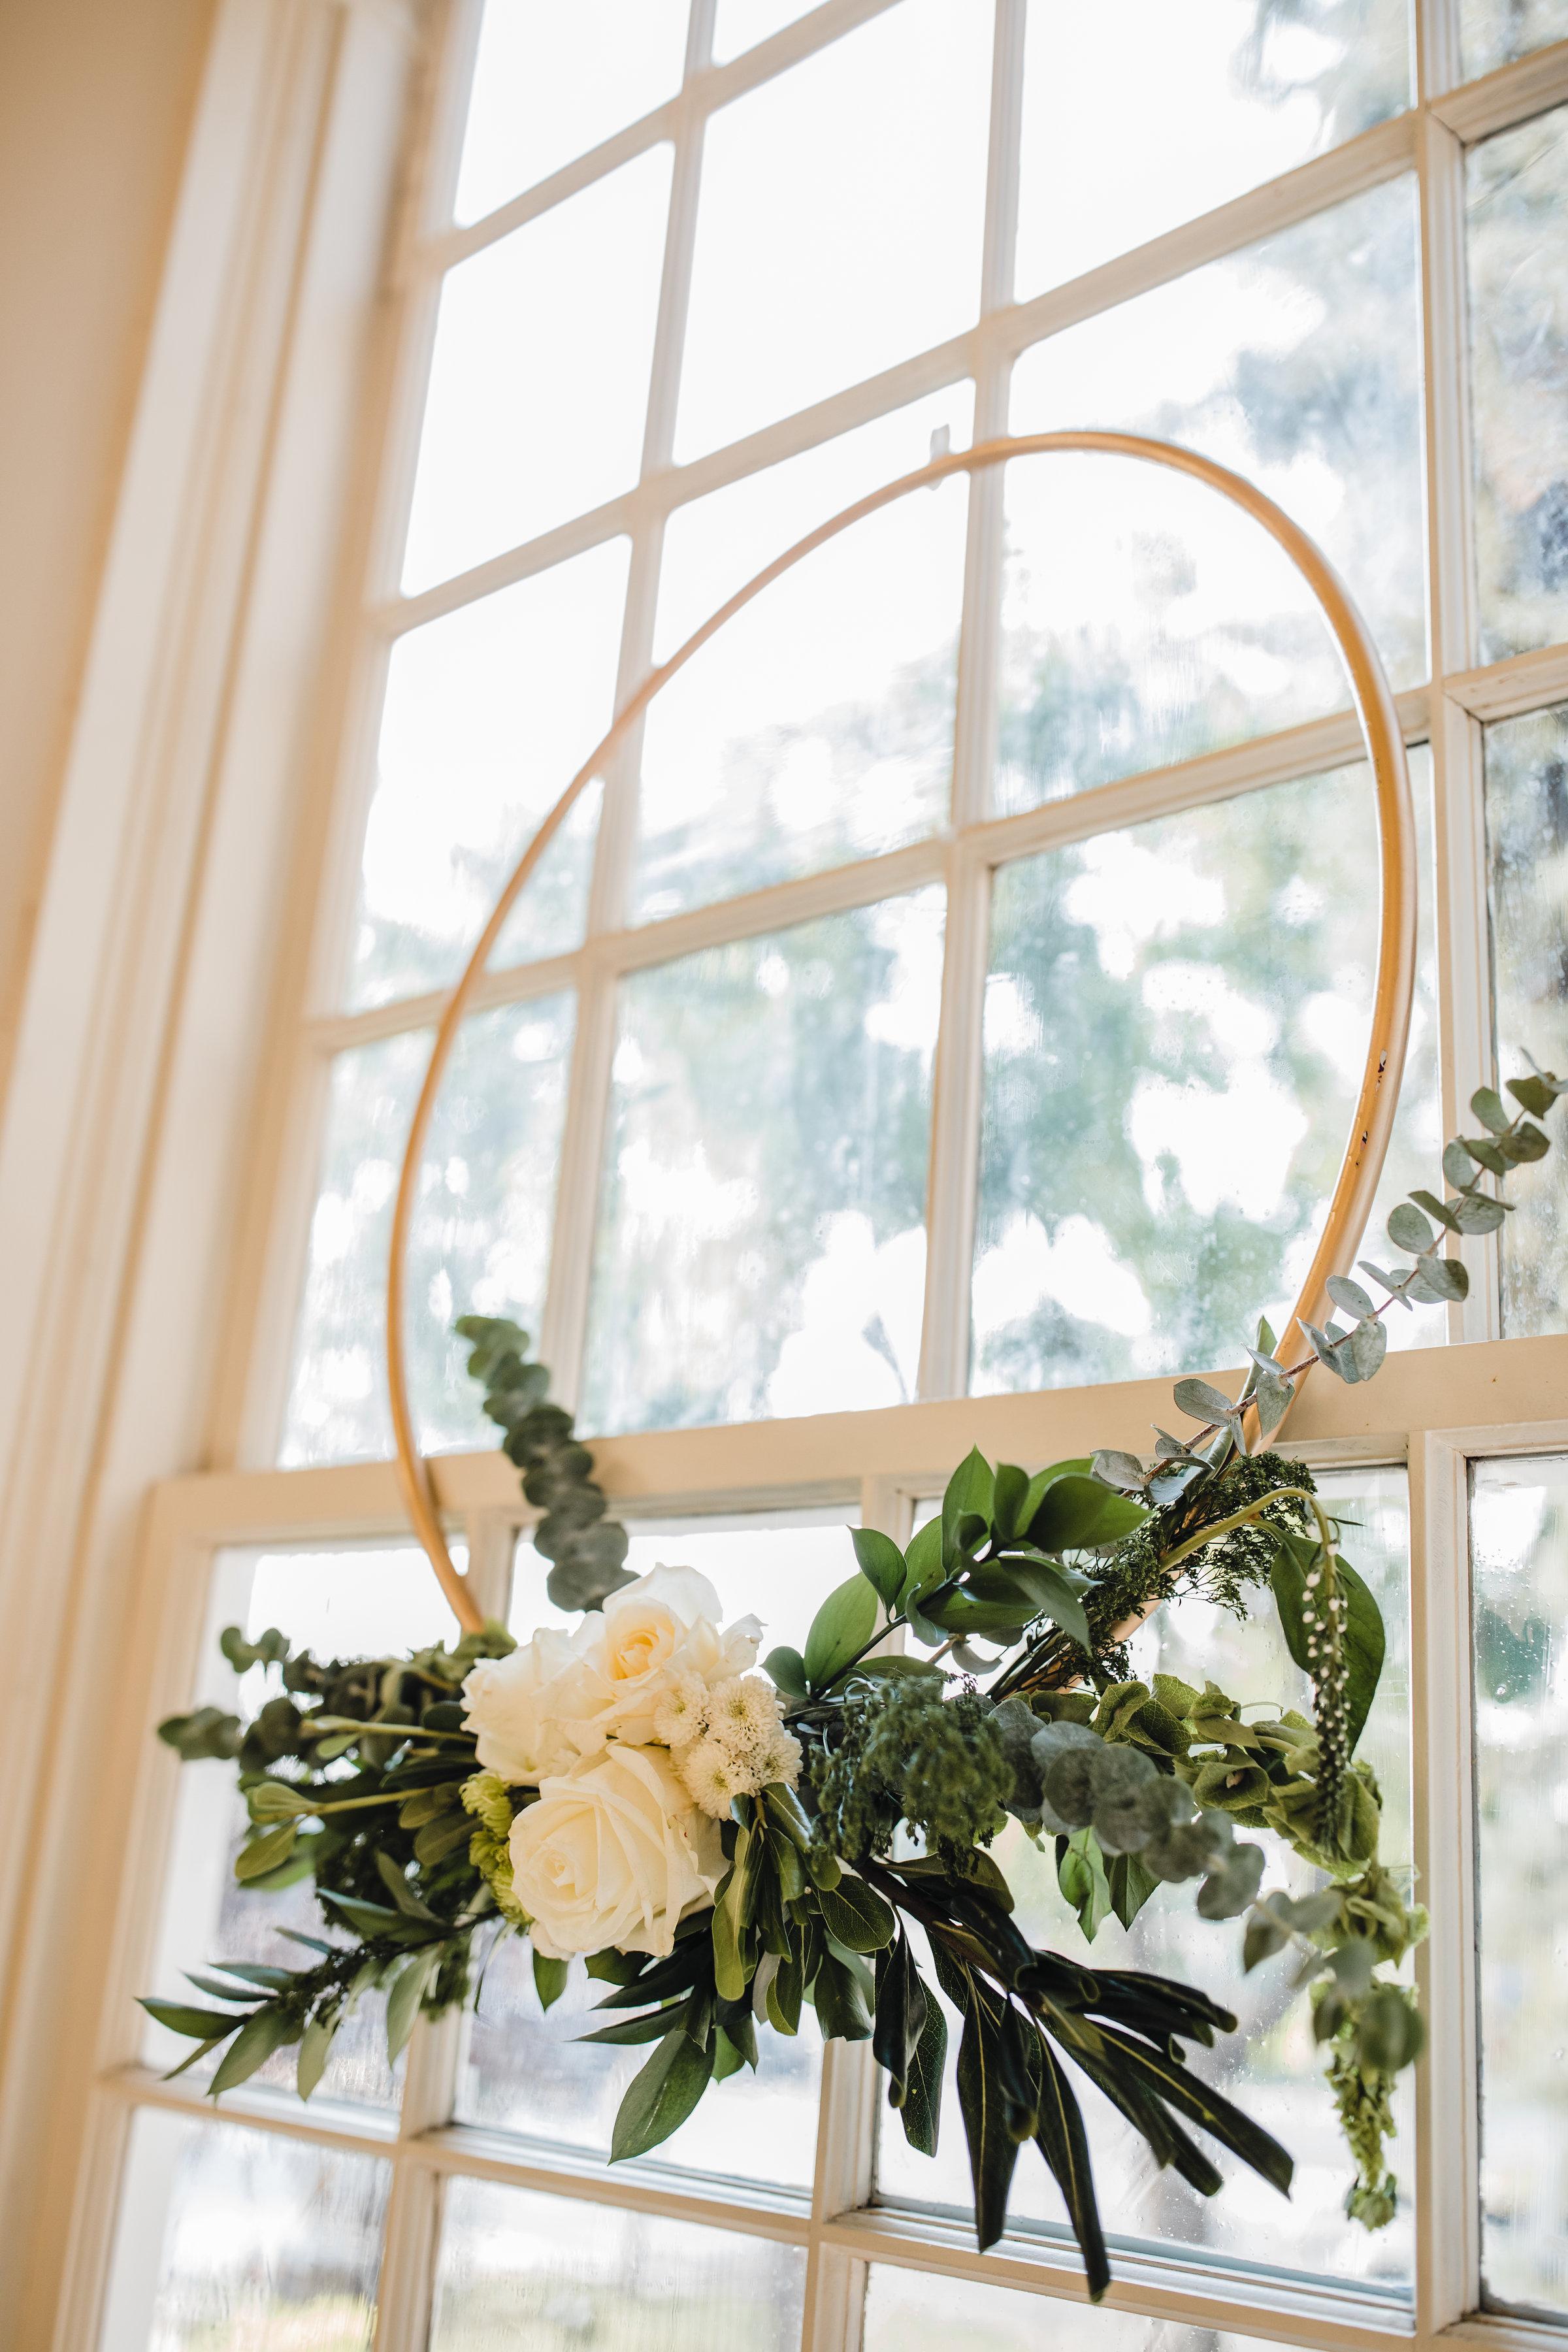 brigham city utah wedding photographer reception white floral arrangement windows